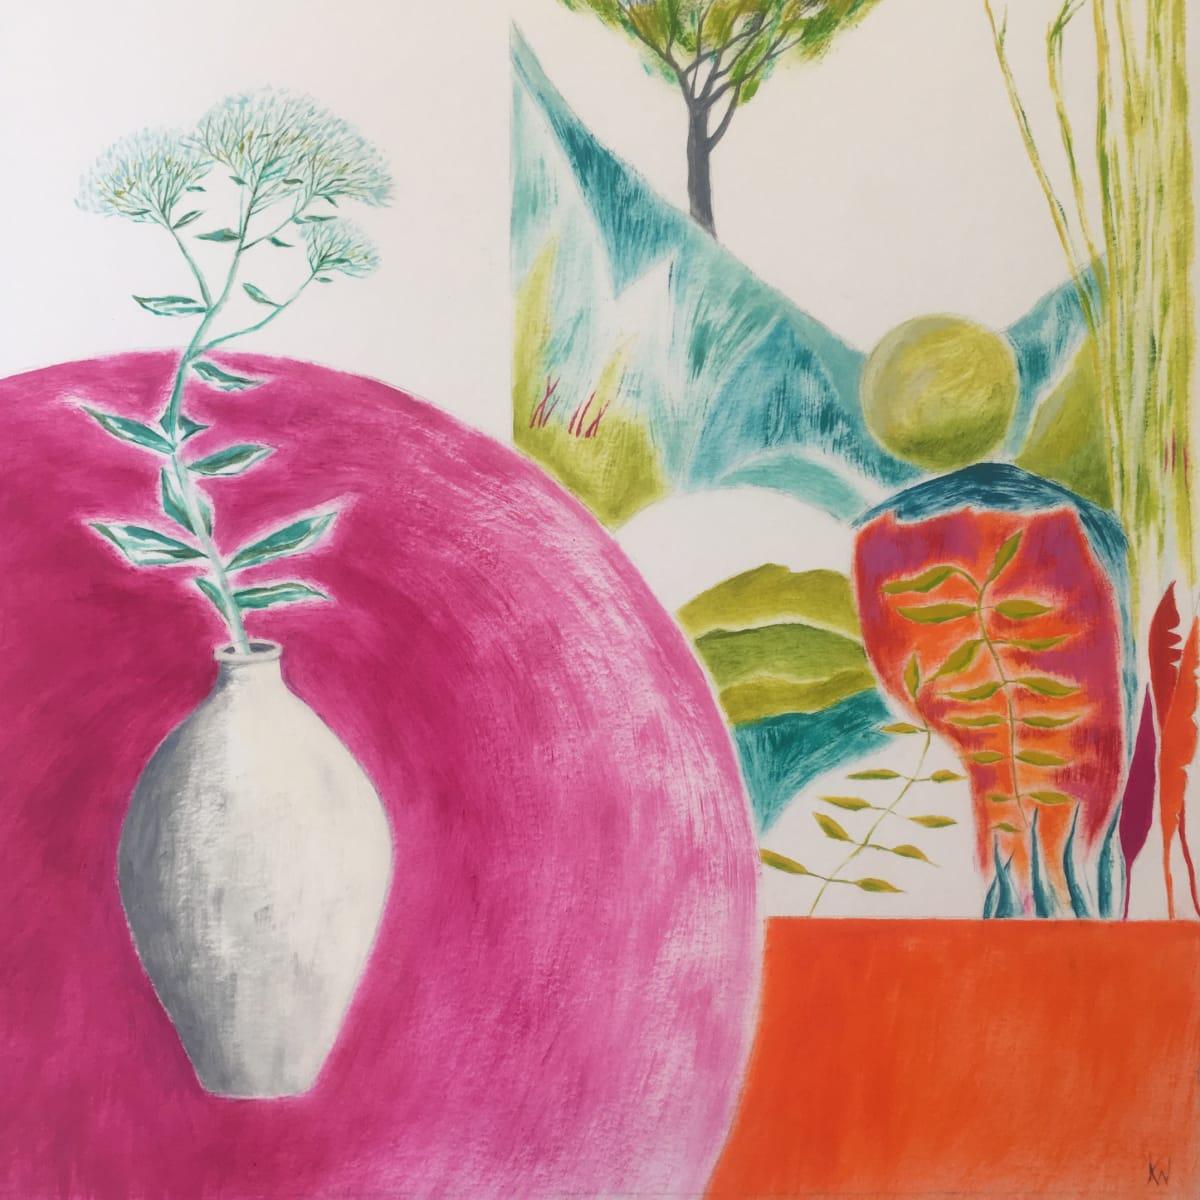 WHI036, Inside Outside by Katie Whitbread